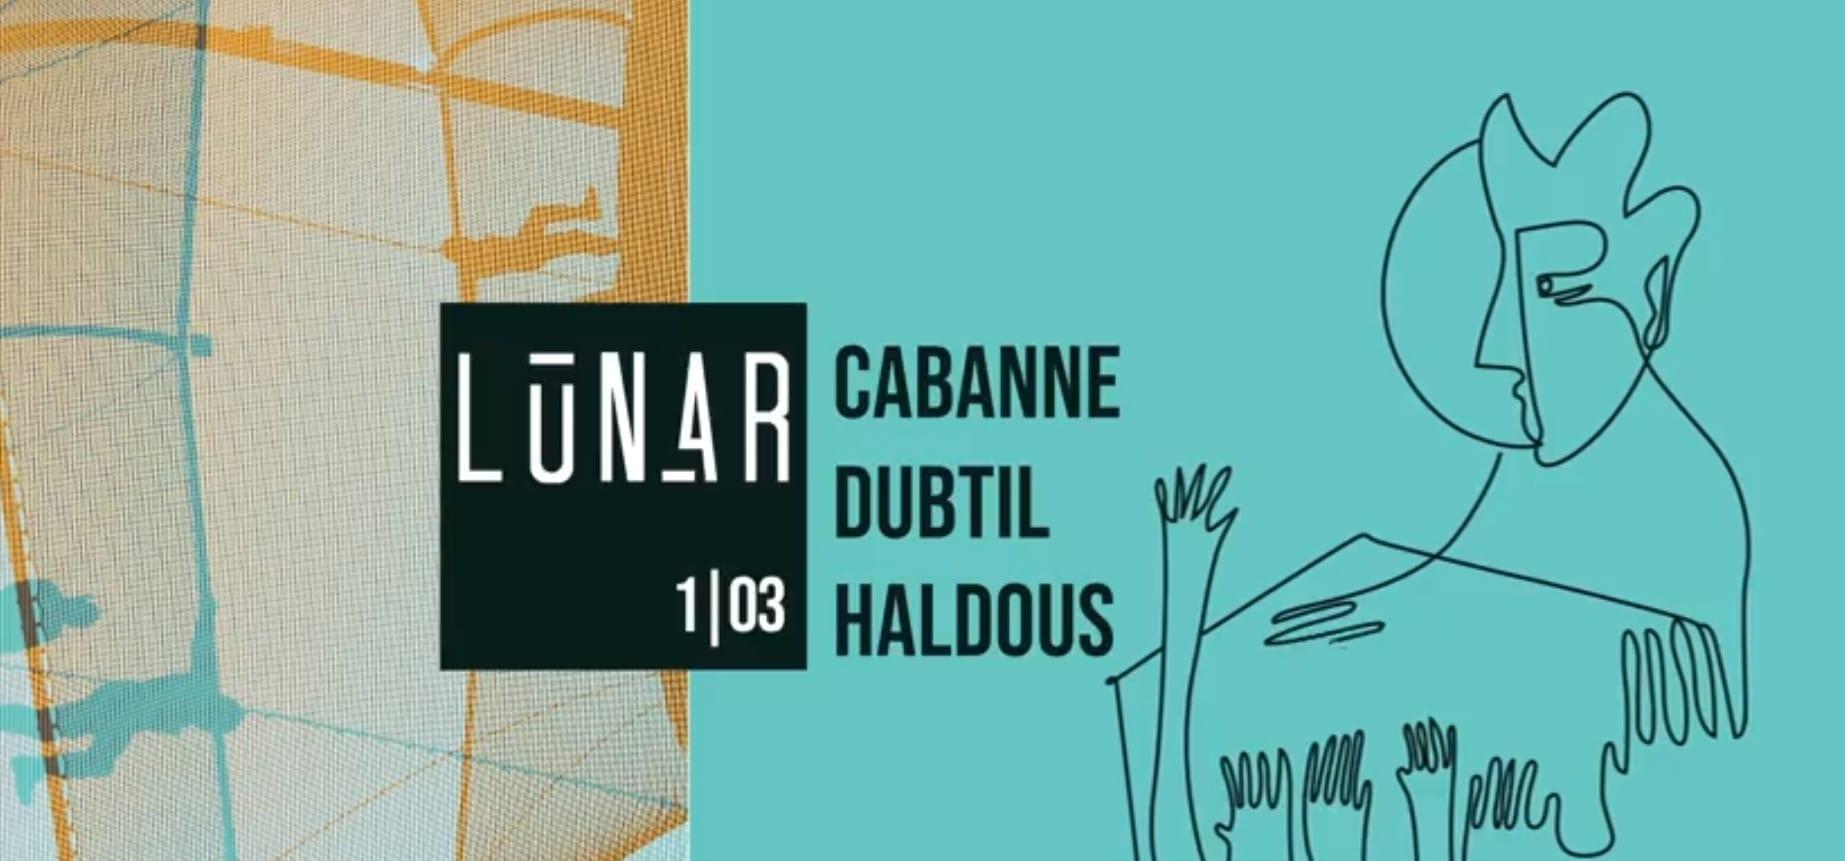 Lunar: Cabanne & Dubtil